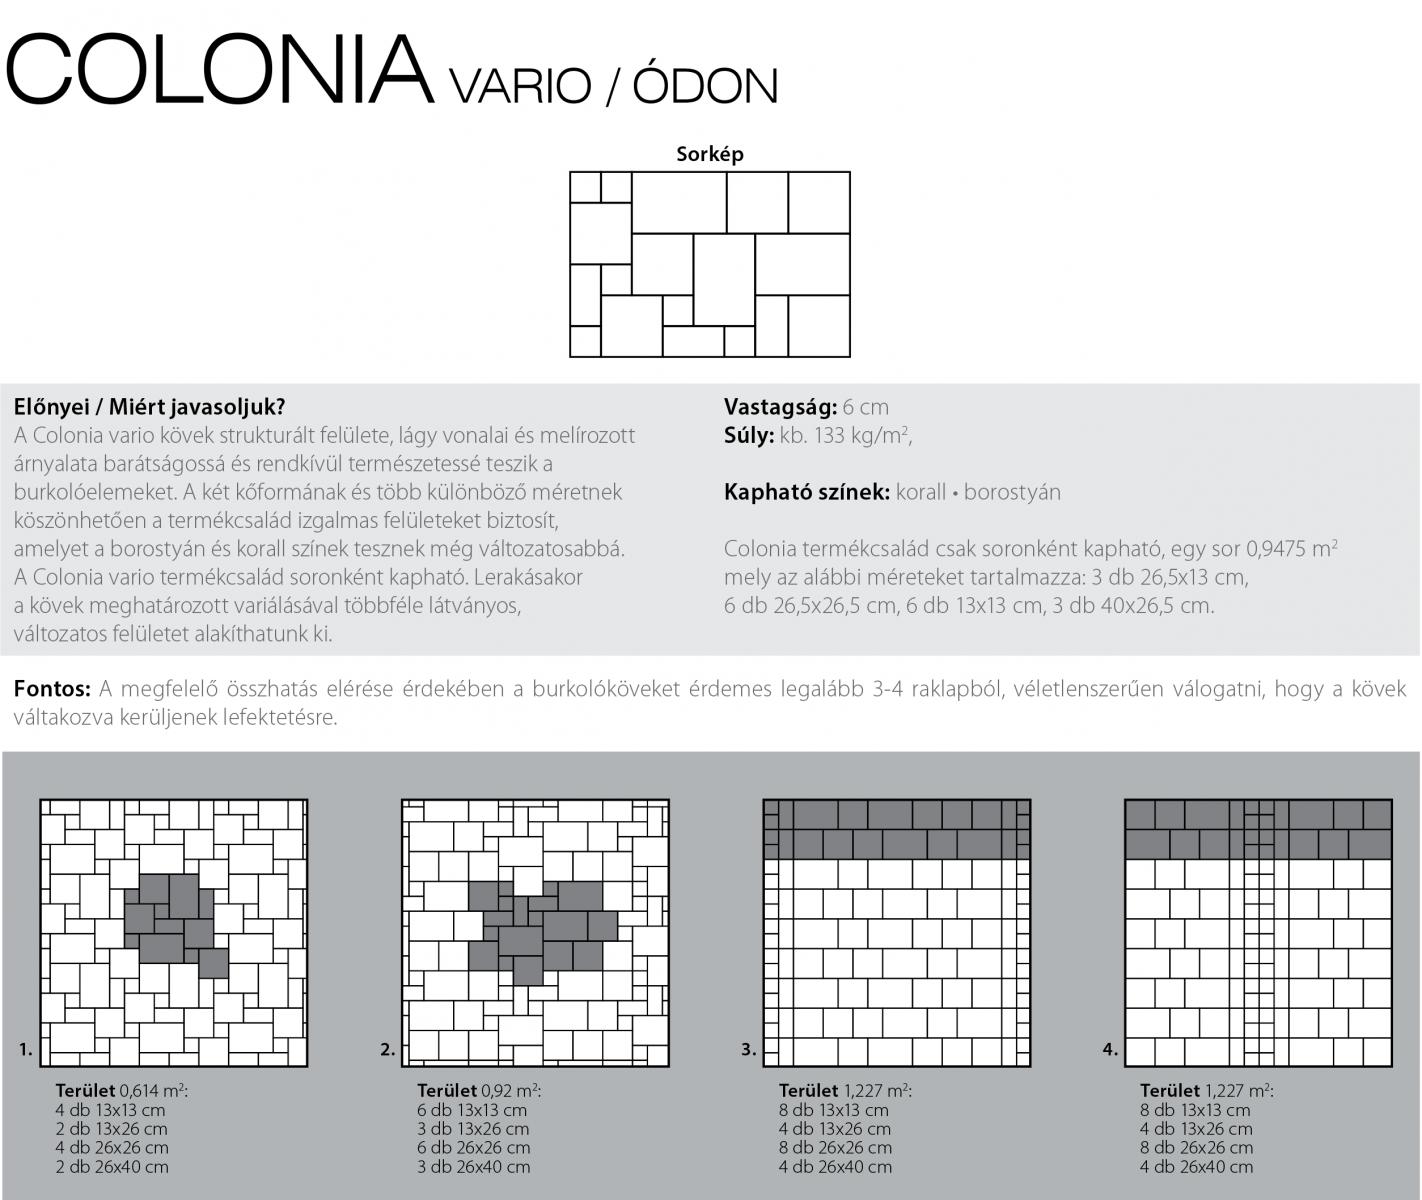 Colonia vario classic technikai információi